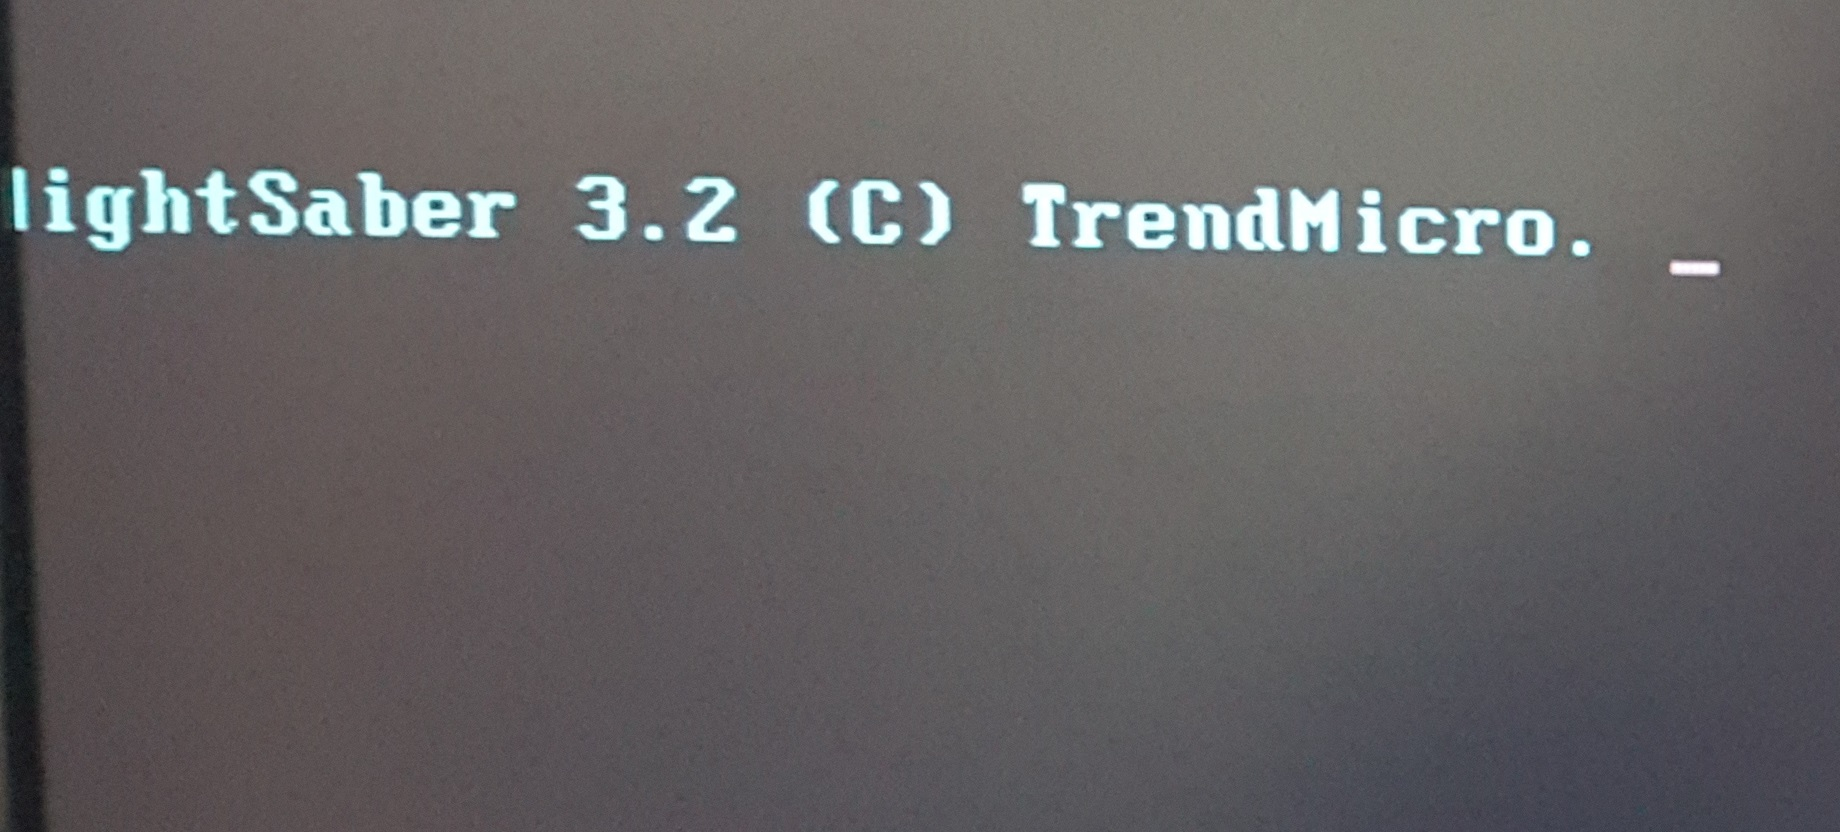 Boot từ USB chứa Trend Micro Ransomware Screen Unlocker Tool